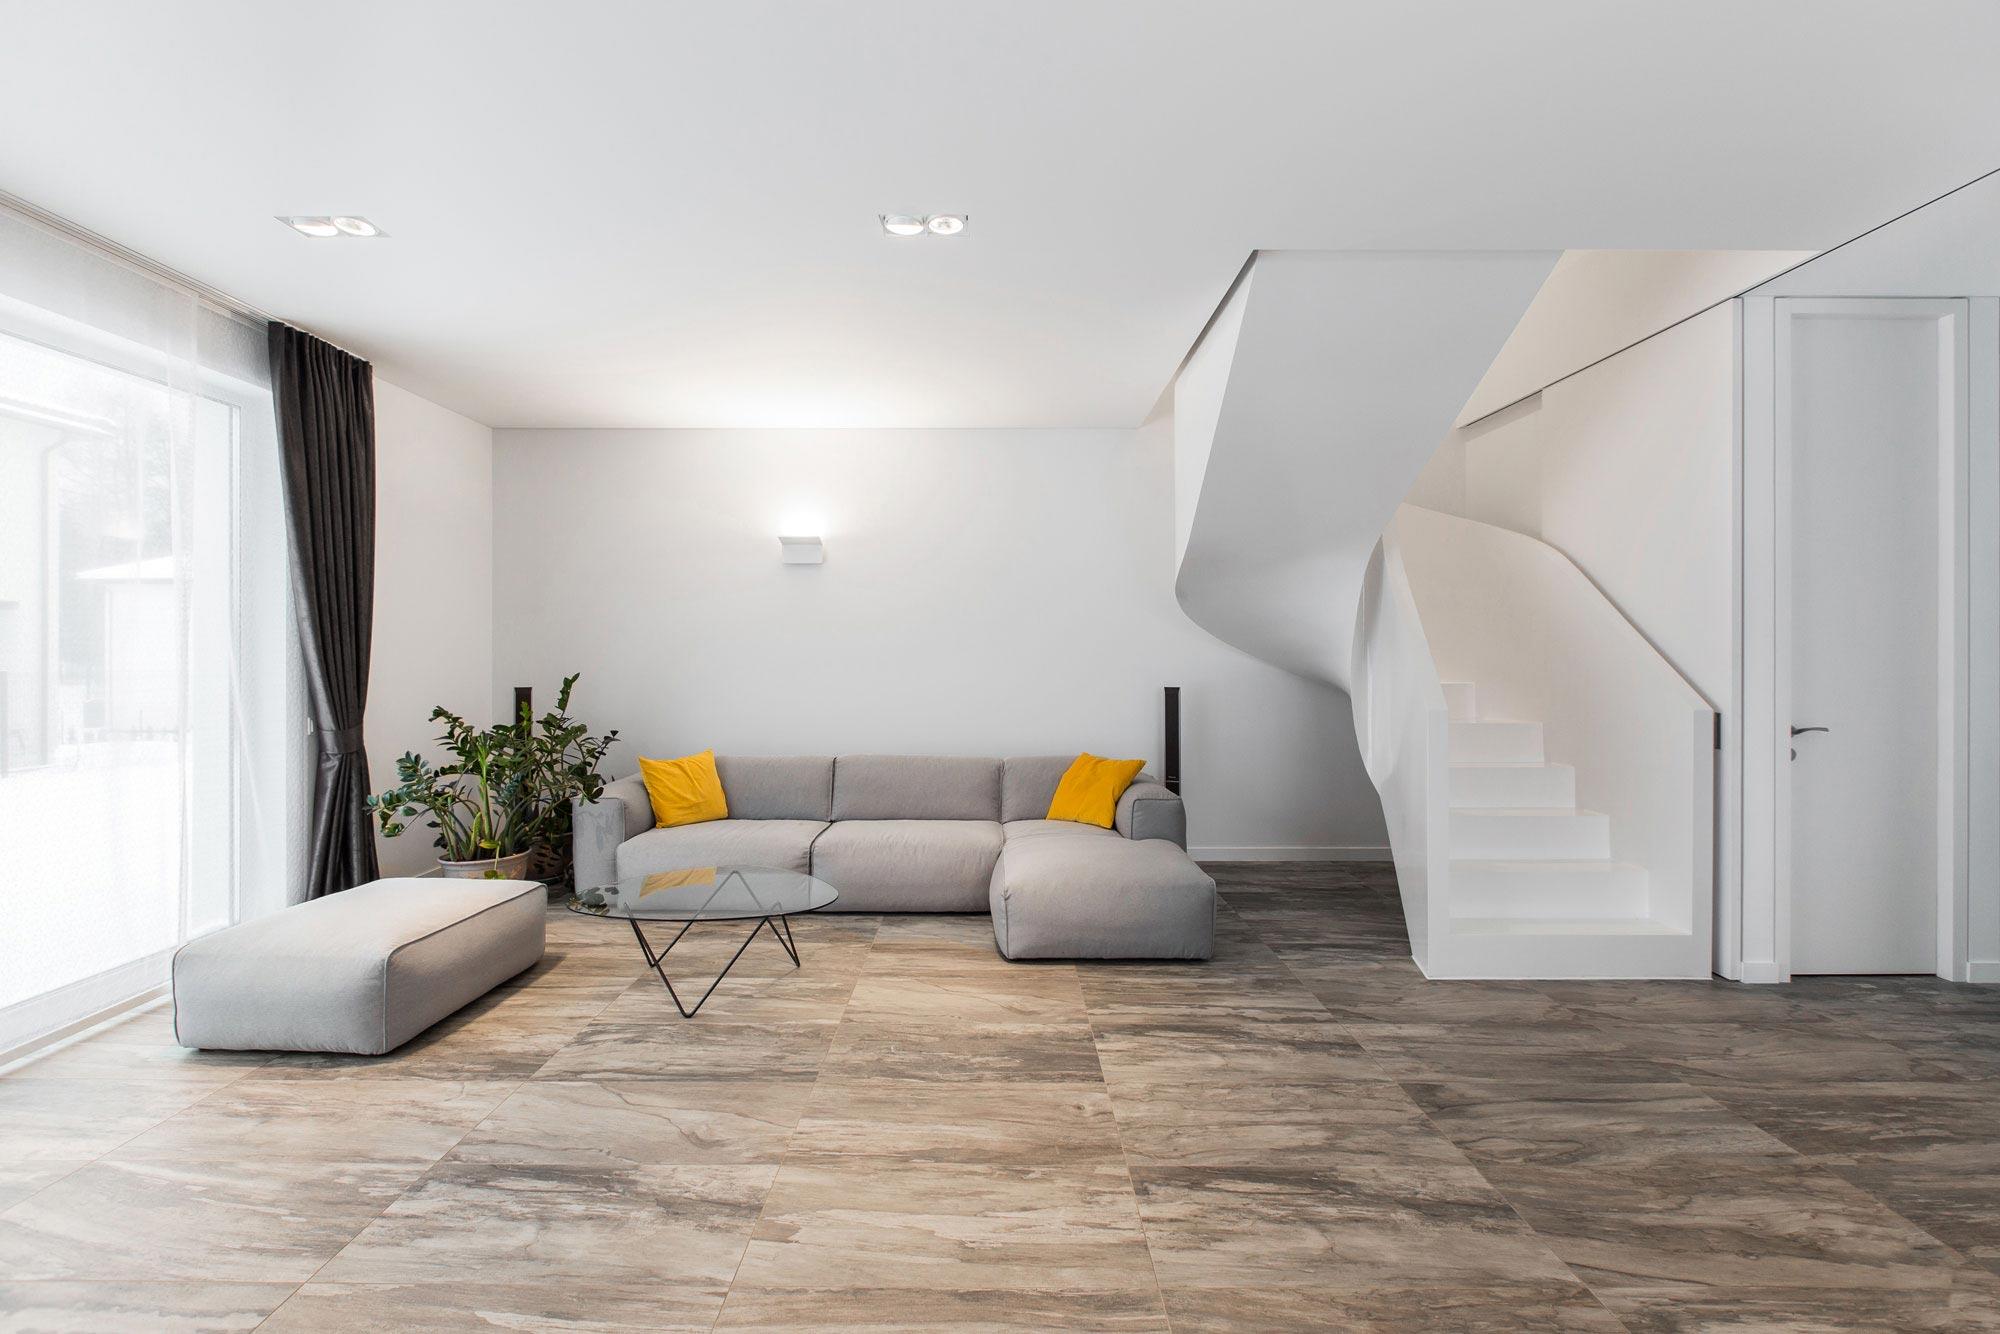 Pavilny minimalist house by ycl studio caandesign for Minimalist studio design